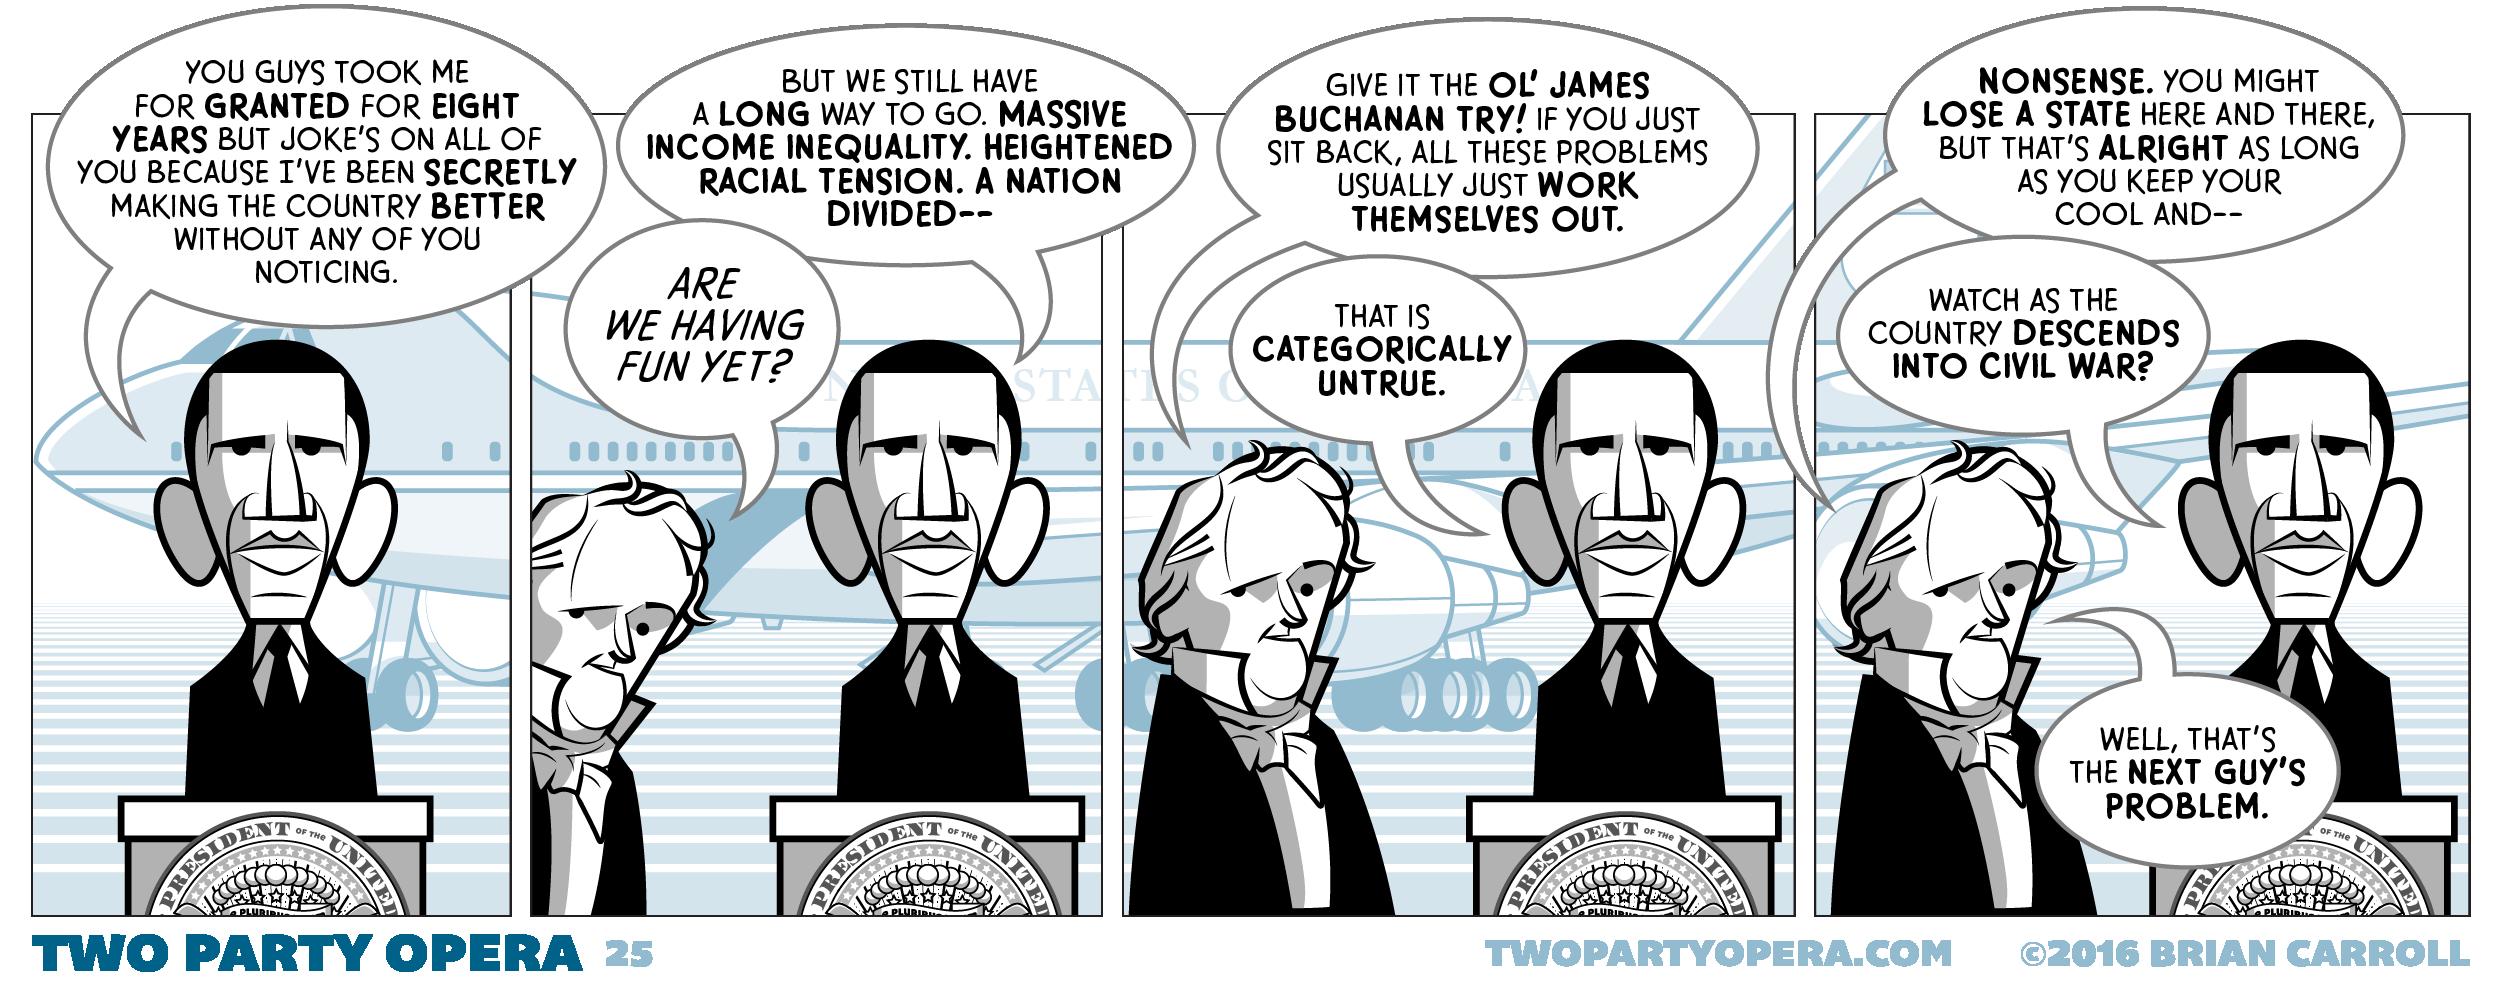 The Ol' James Buchanan Try